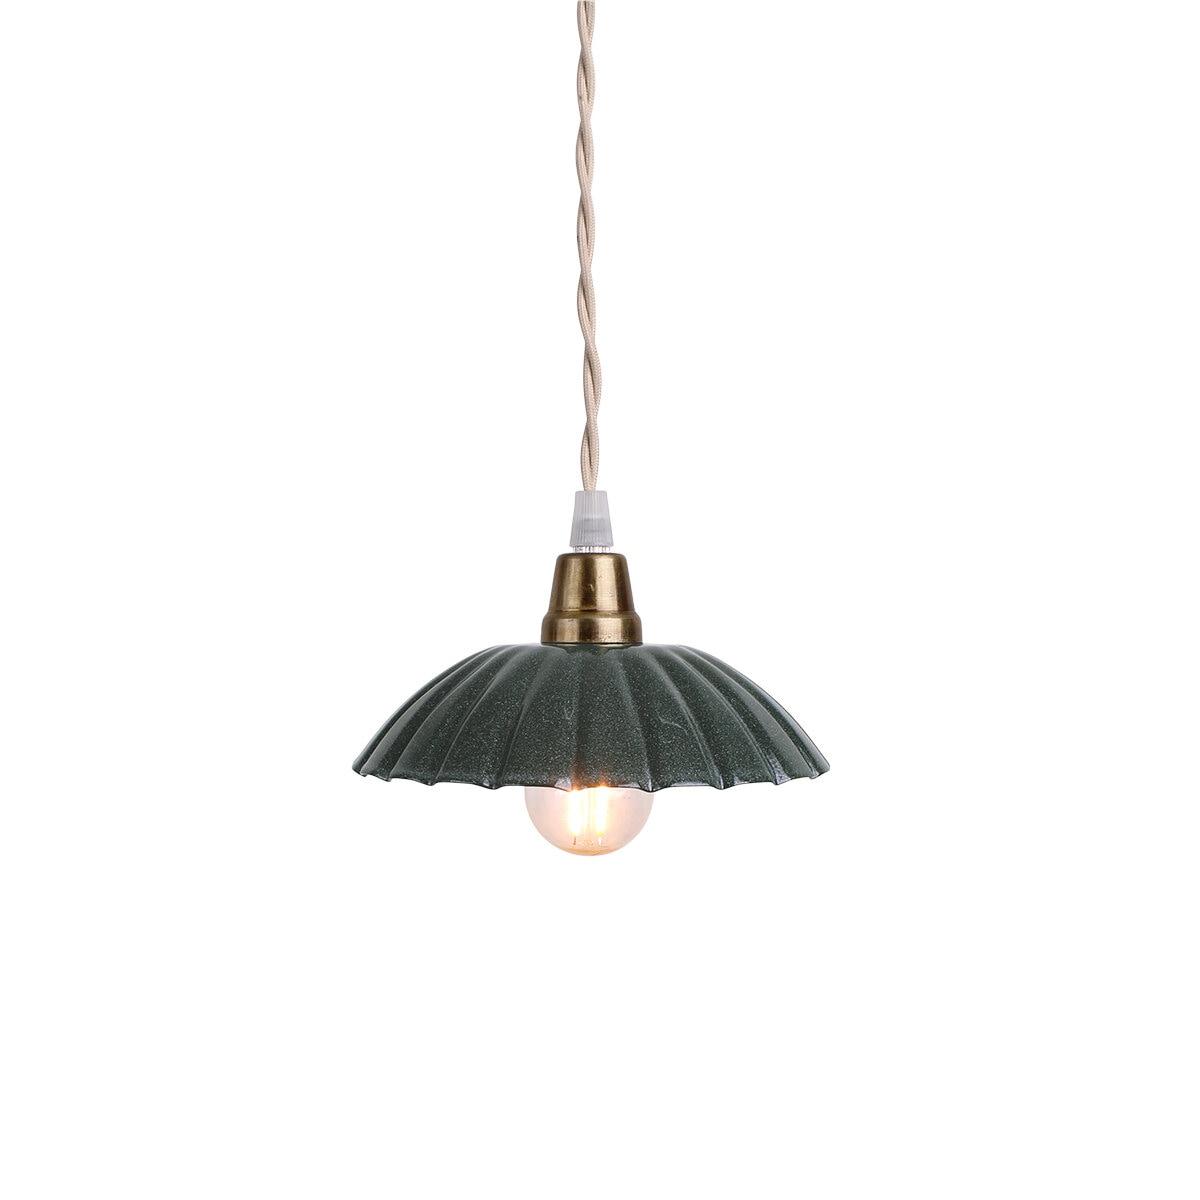 Pendant Lamp Ingrid Dark Green Small